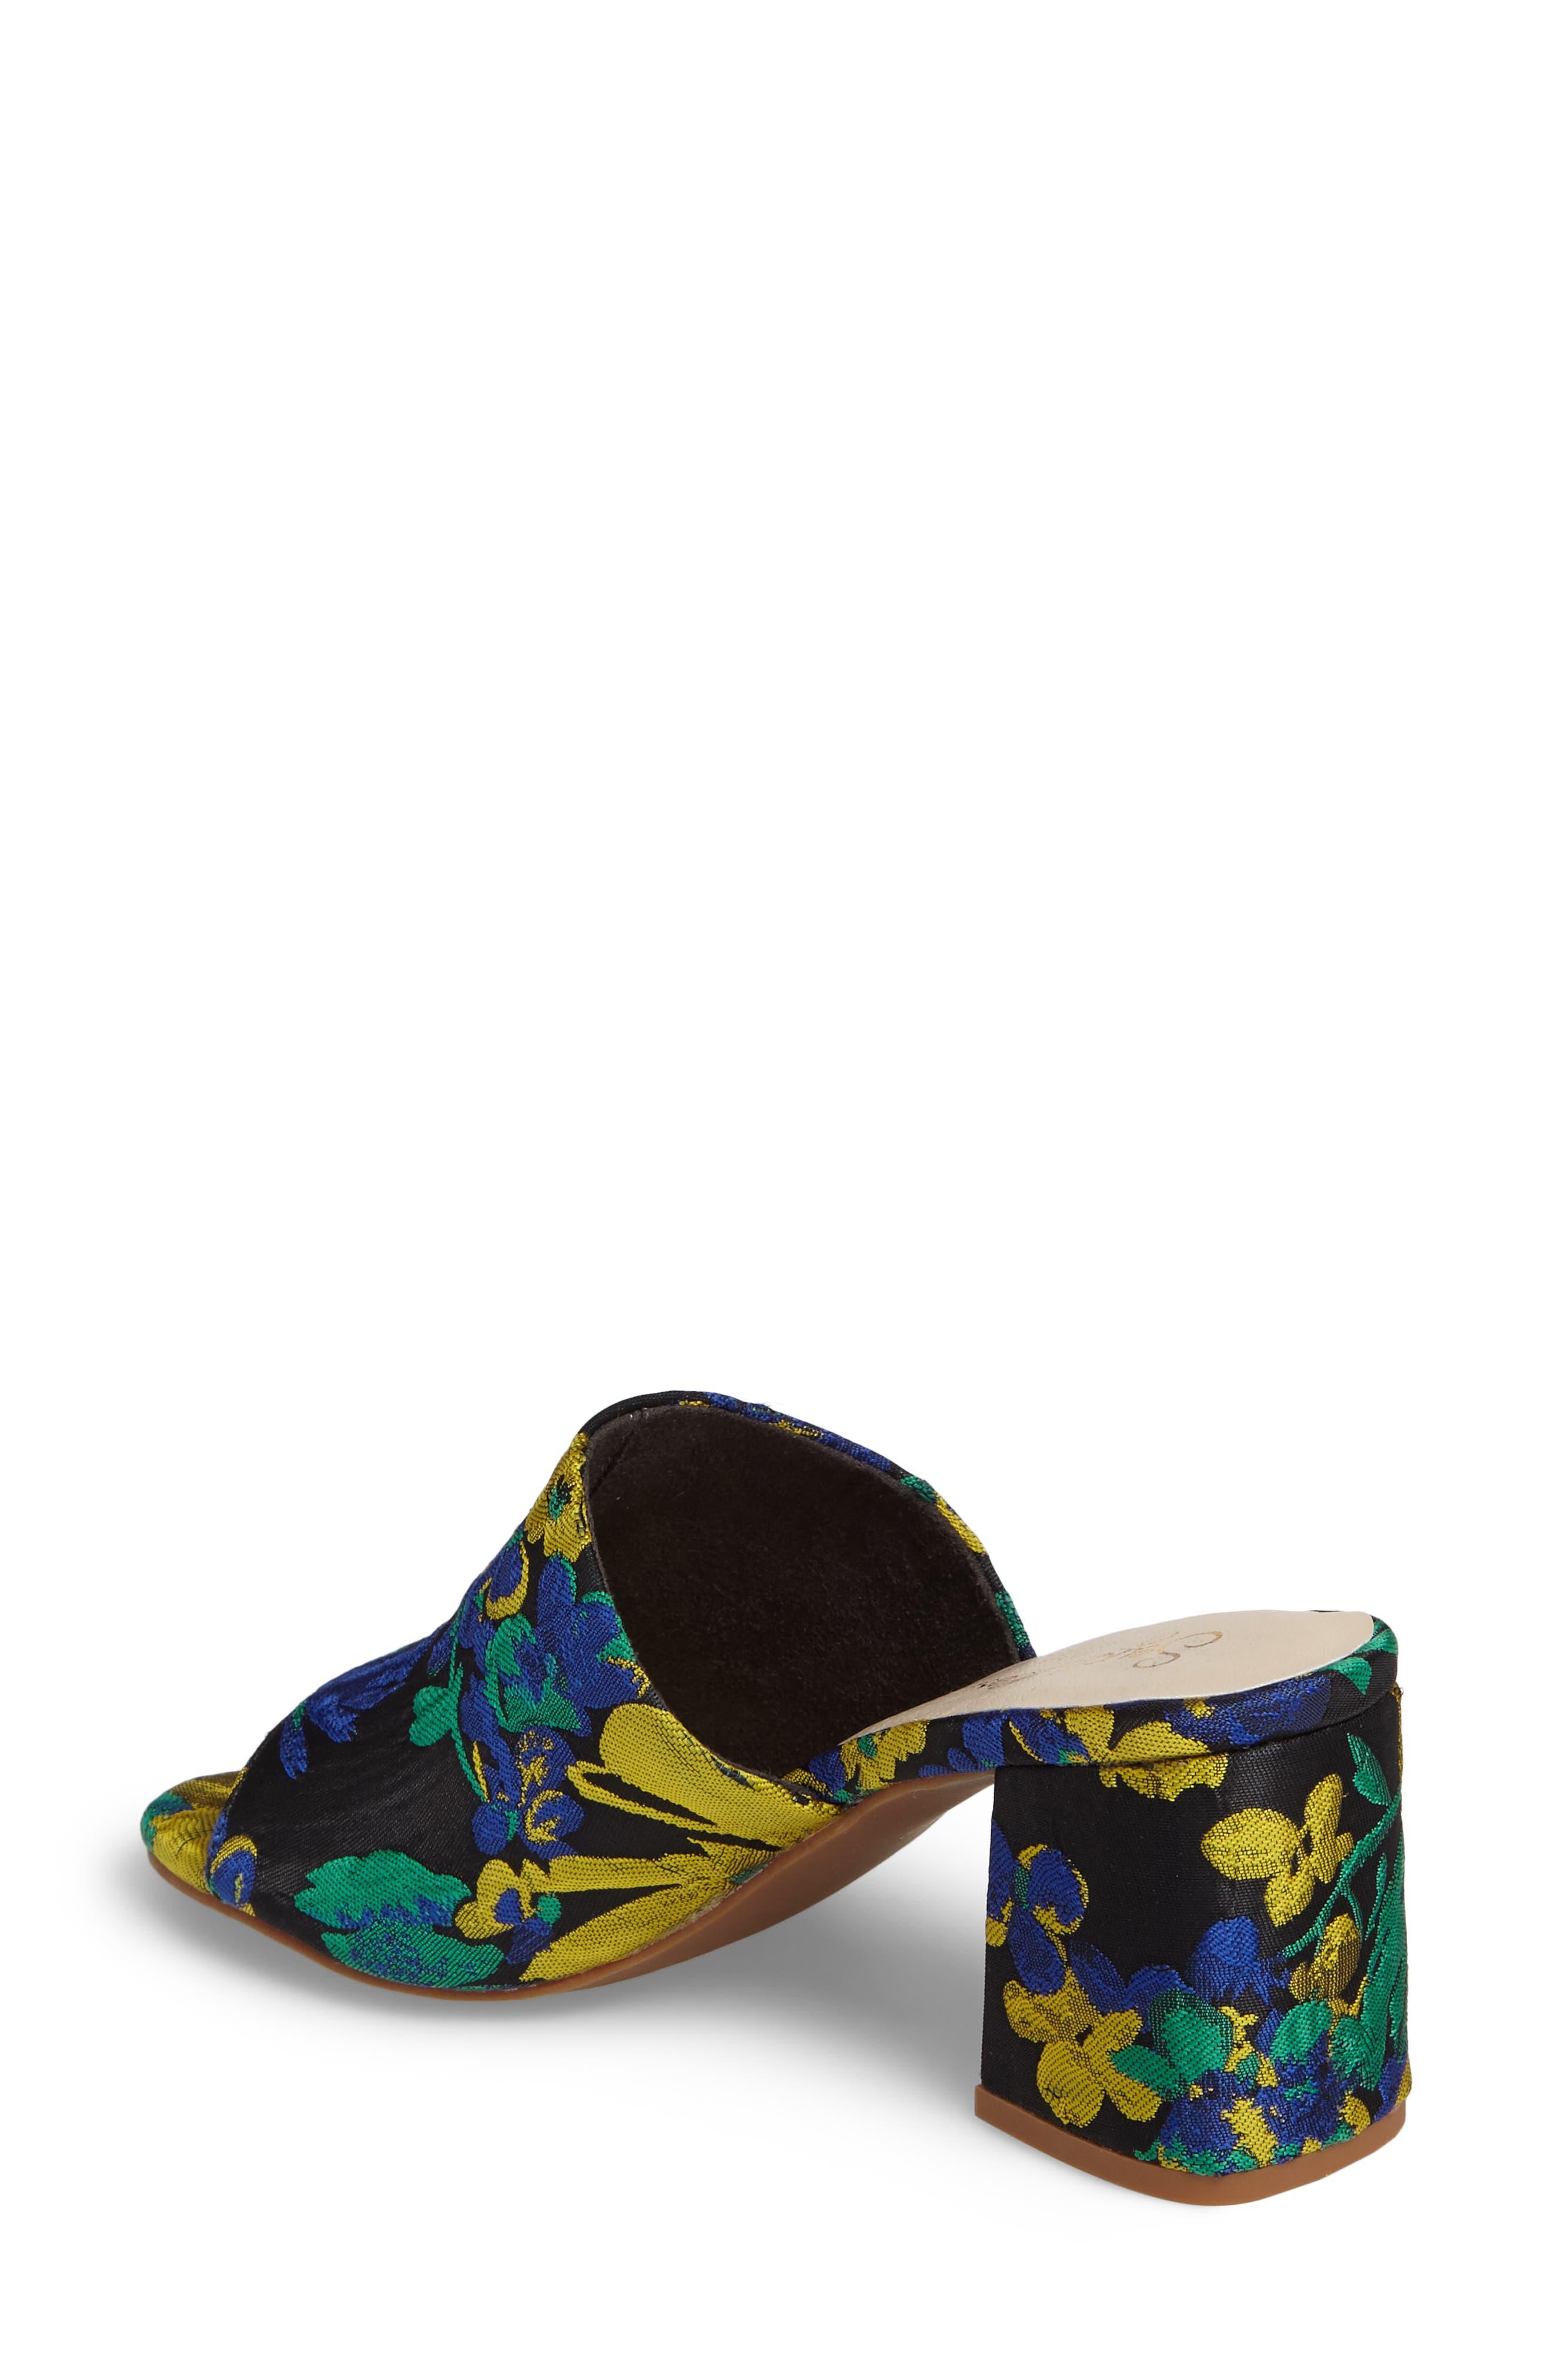 Alternate Image 2  - Seychelles Commute Floral Flared Heel Sandal (Women)